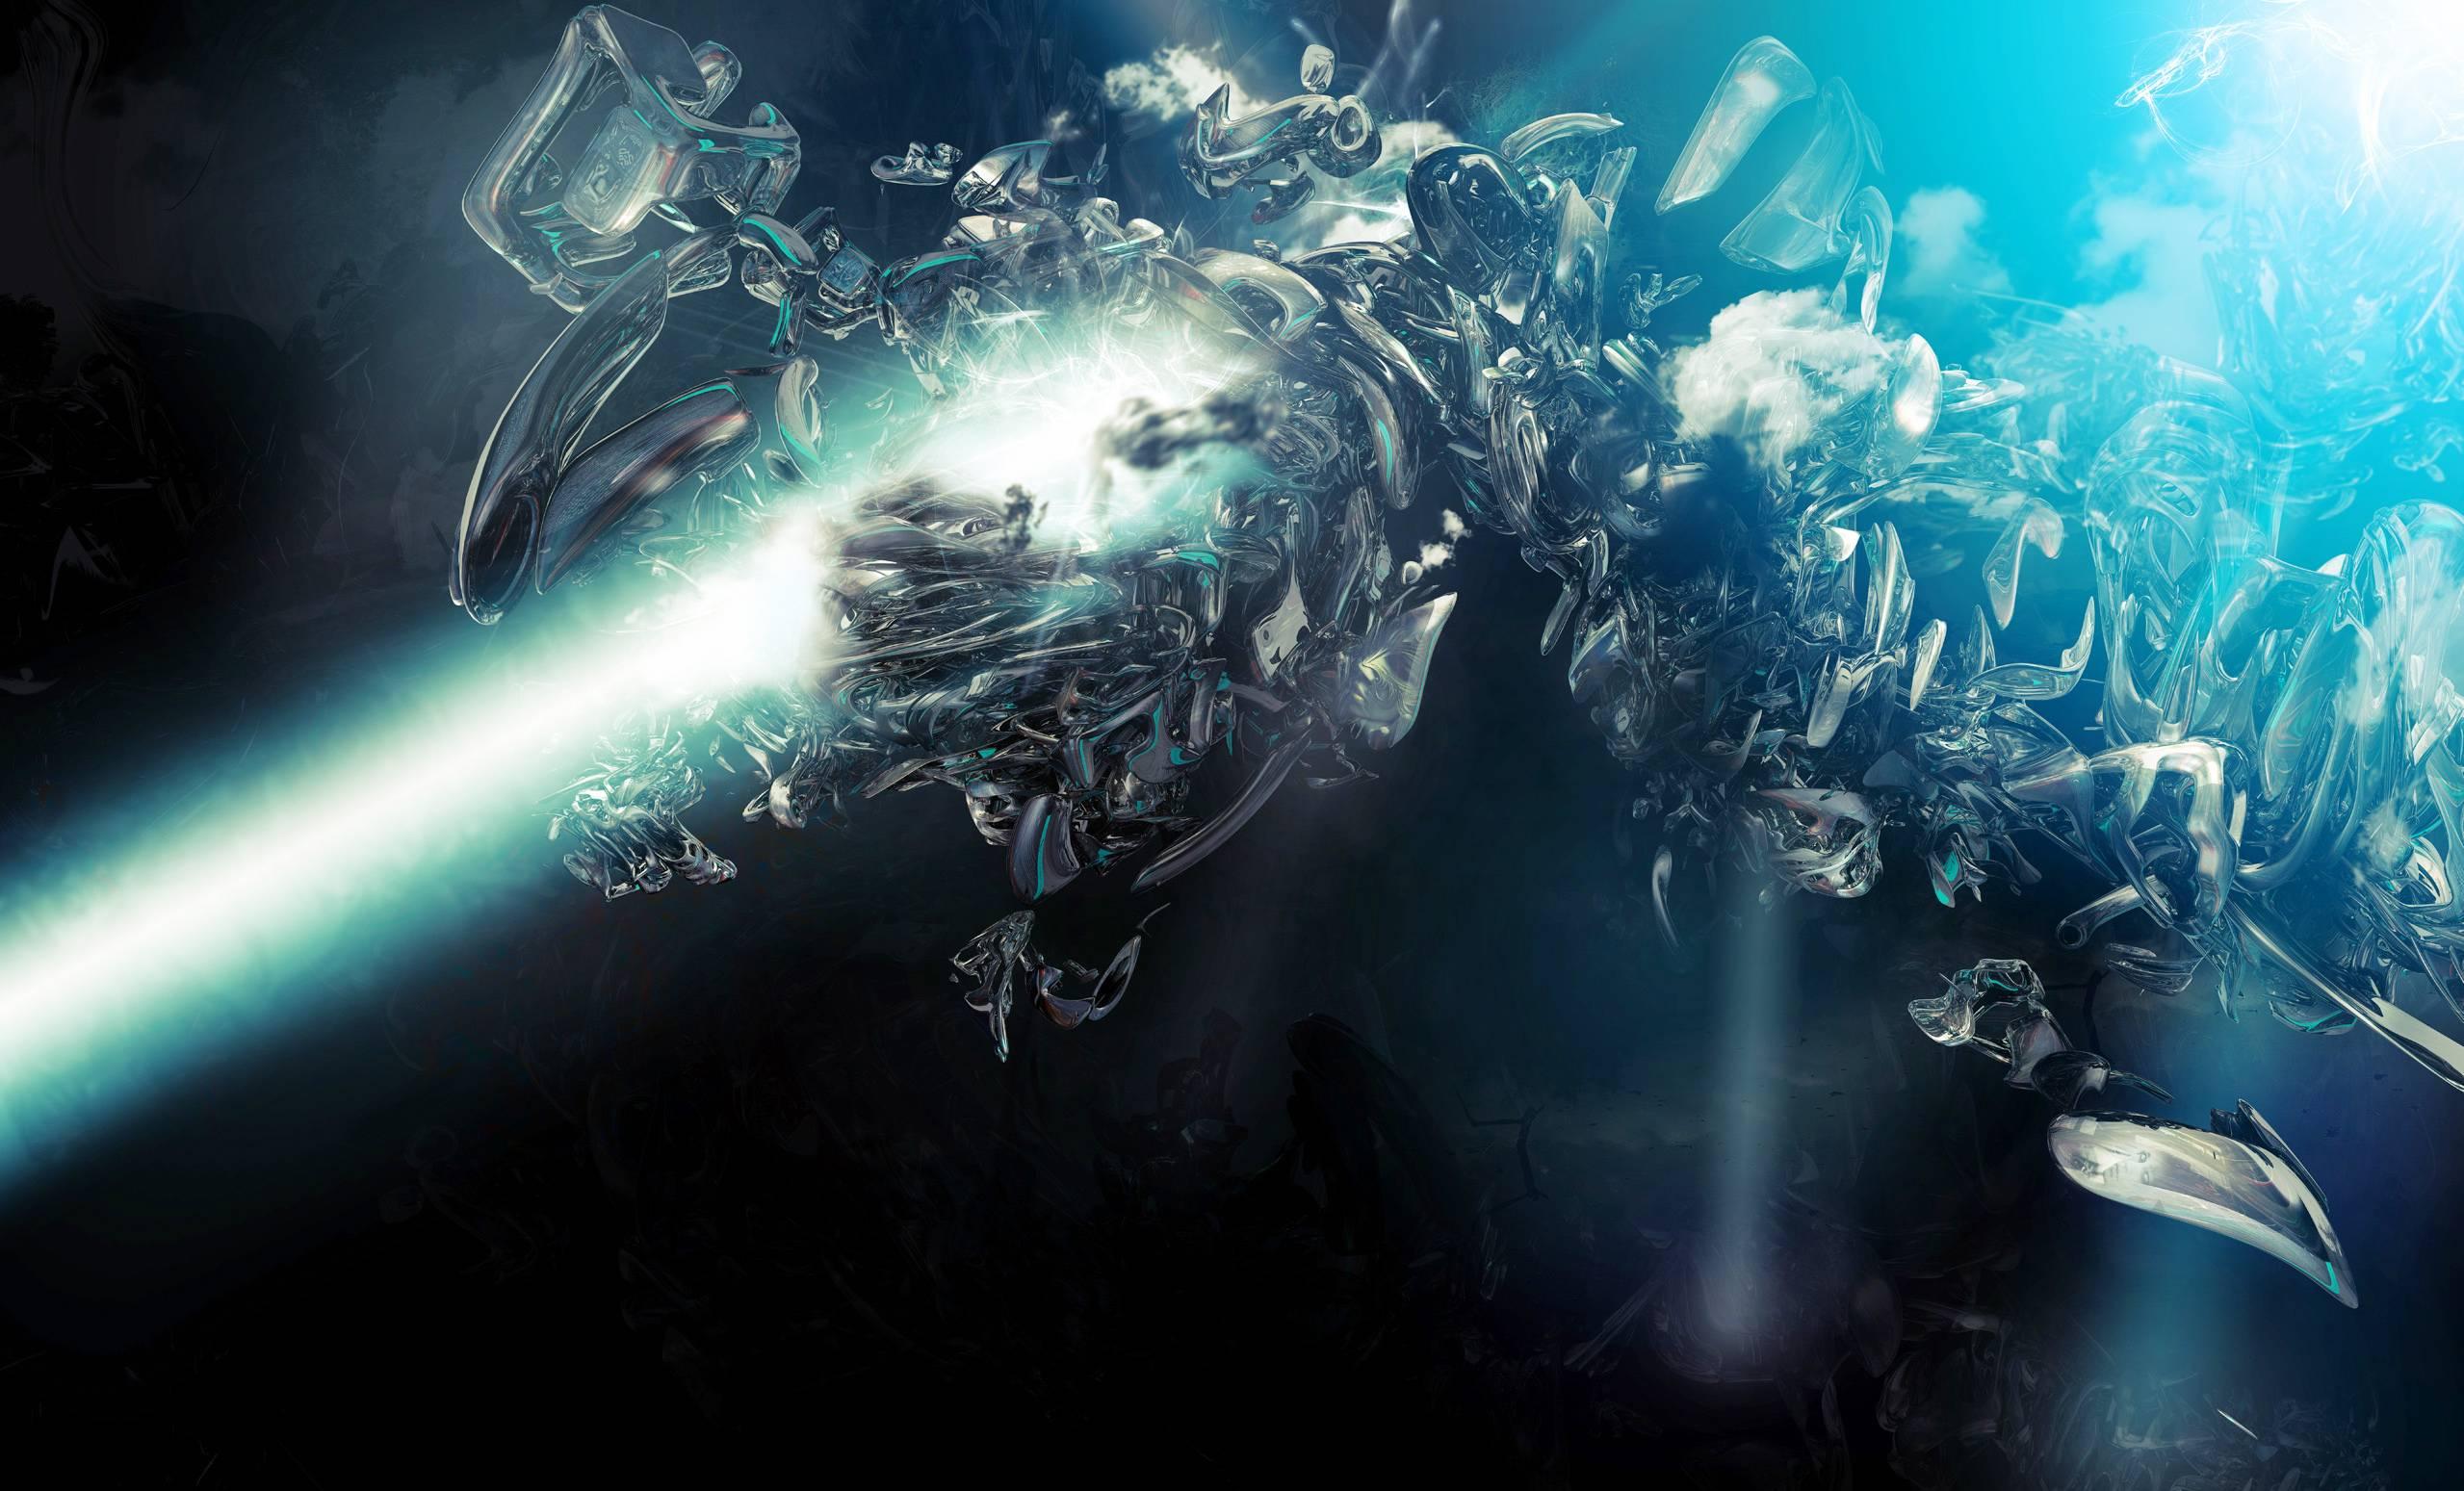 sci fi backgrounds - photo #32